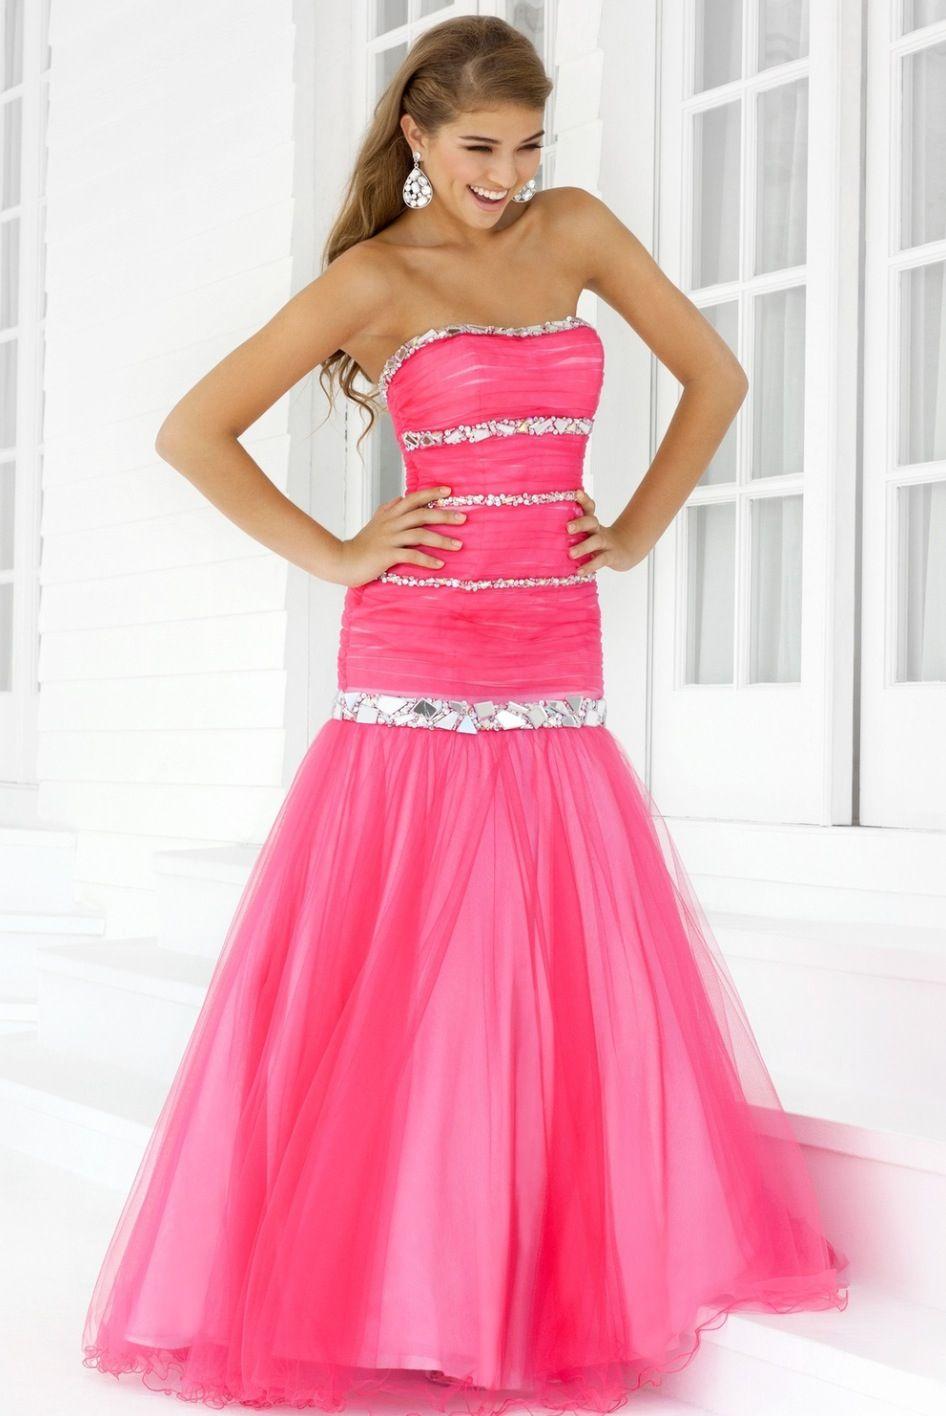 cute hot pink prom dress | Ashley\'s board | Pinterest | Hot pink ...